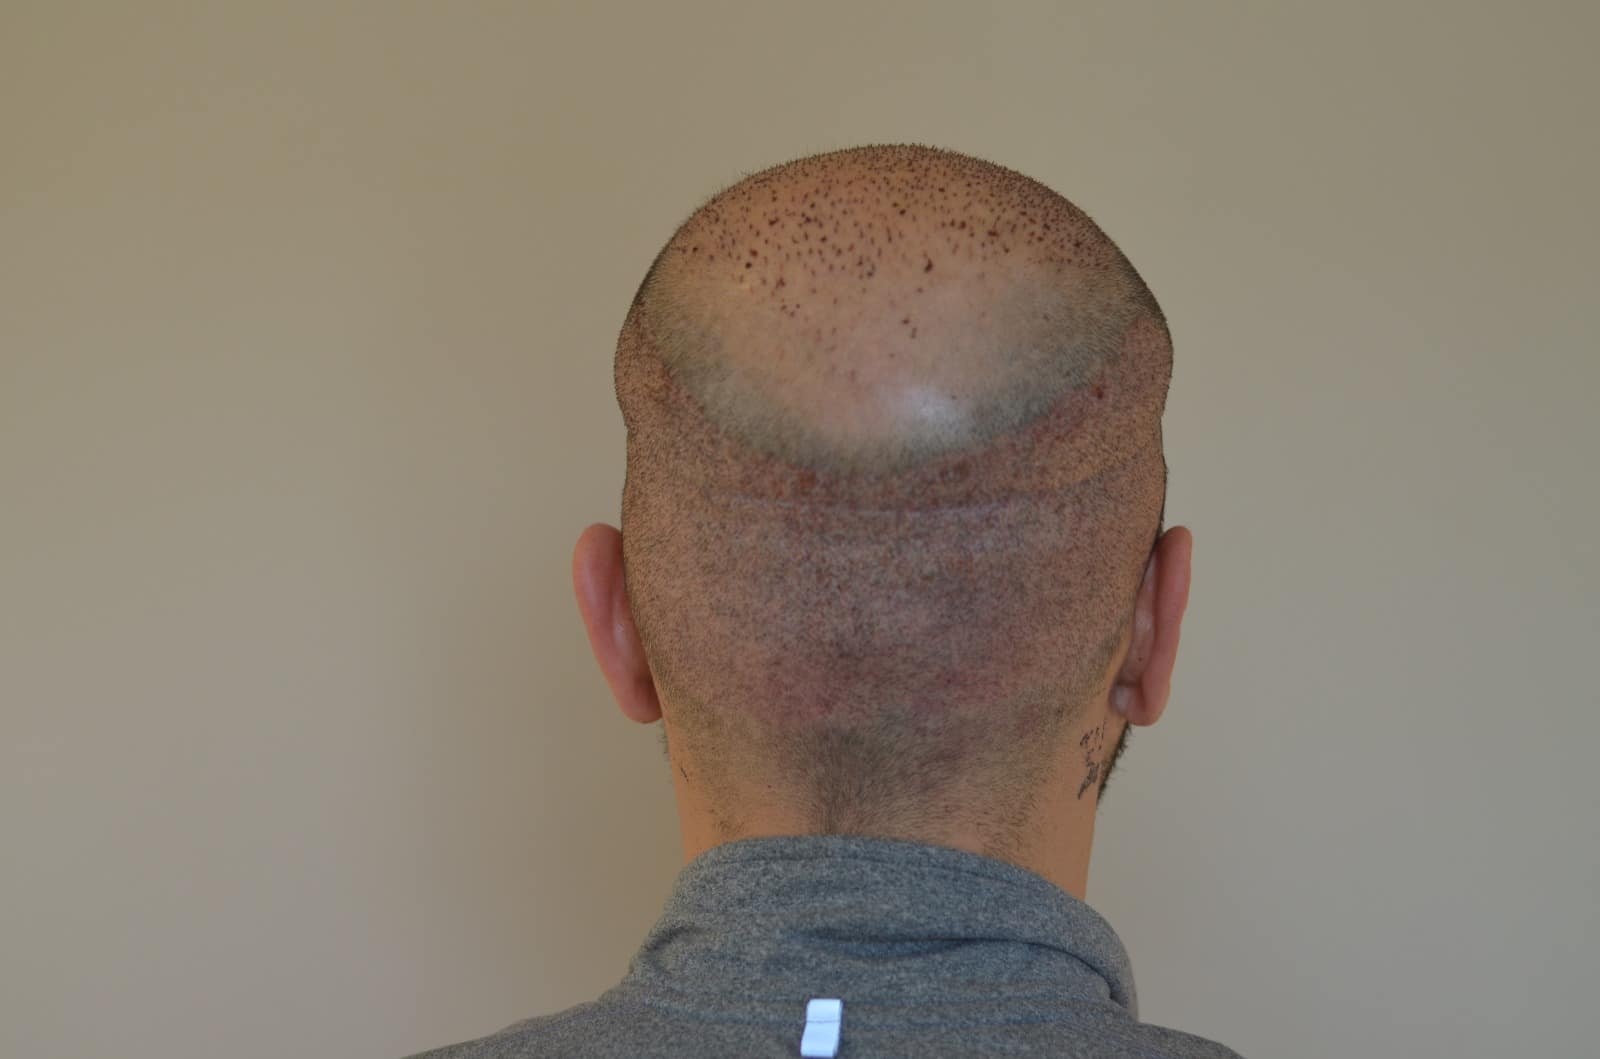 haar-transplantation-in-der-türkei-istanbul (6)